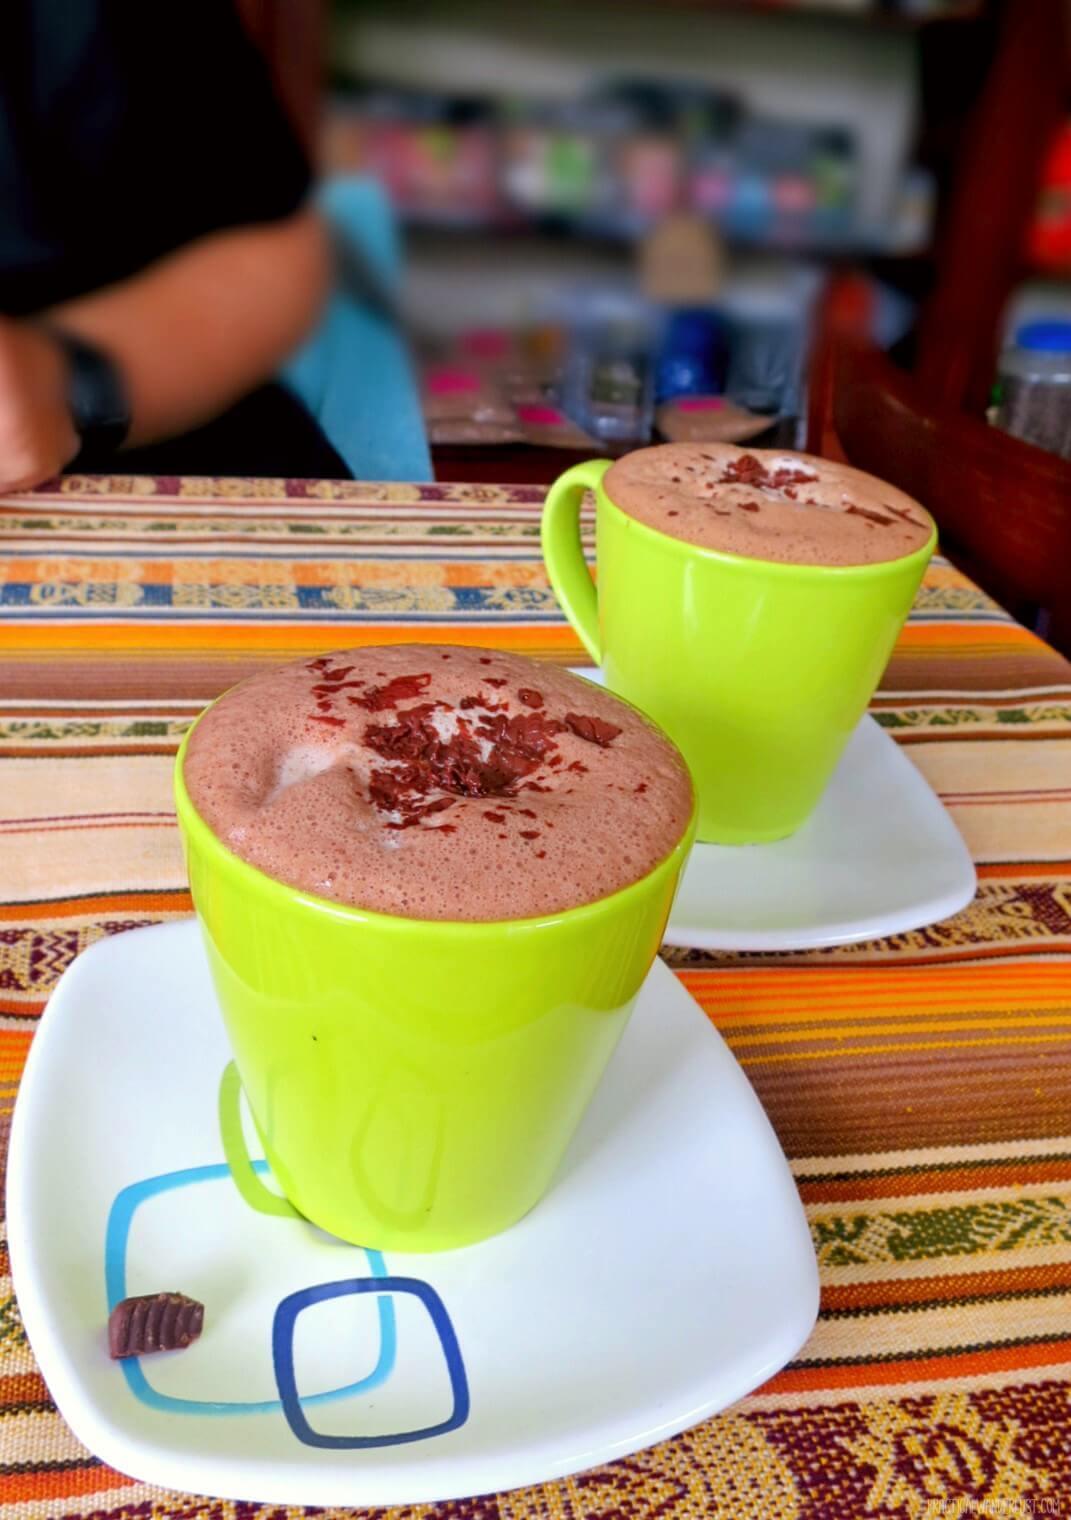 Delectable hot chocolate from Amore in Banos, Ecuador